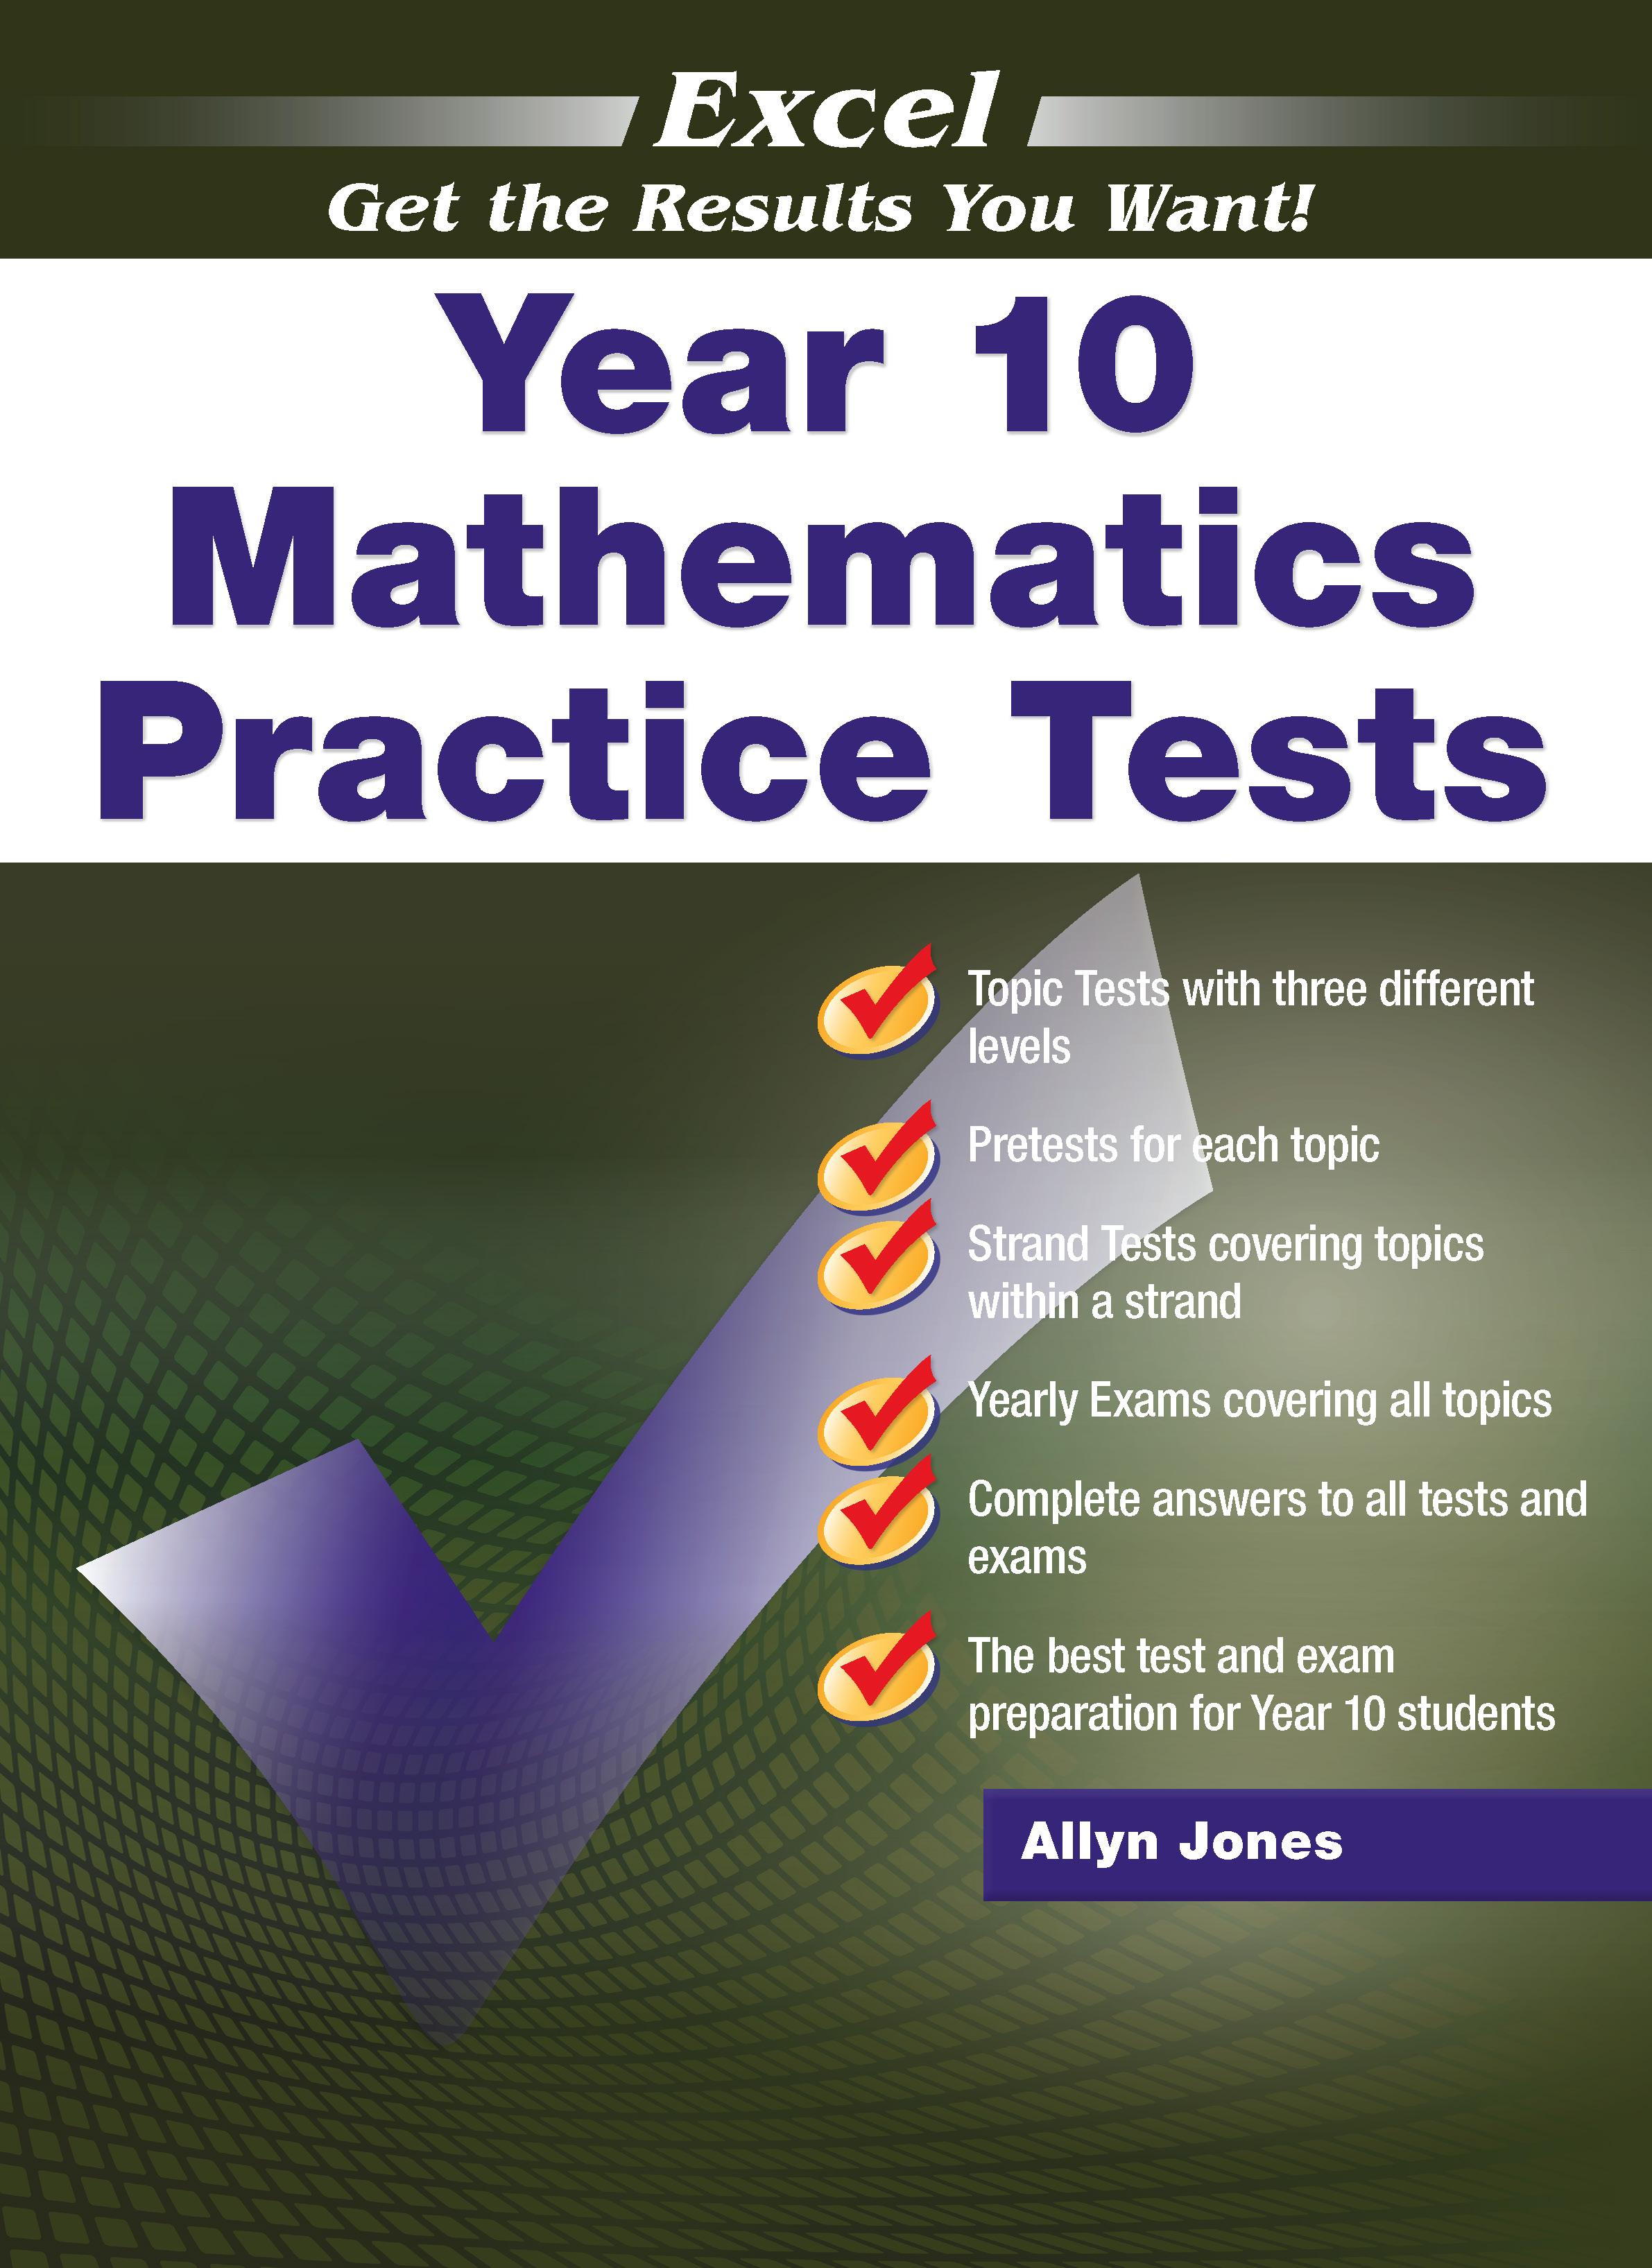 Excel Mathematics Practice Tests Year 10